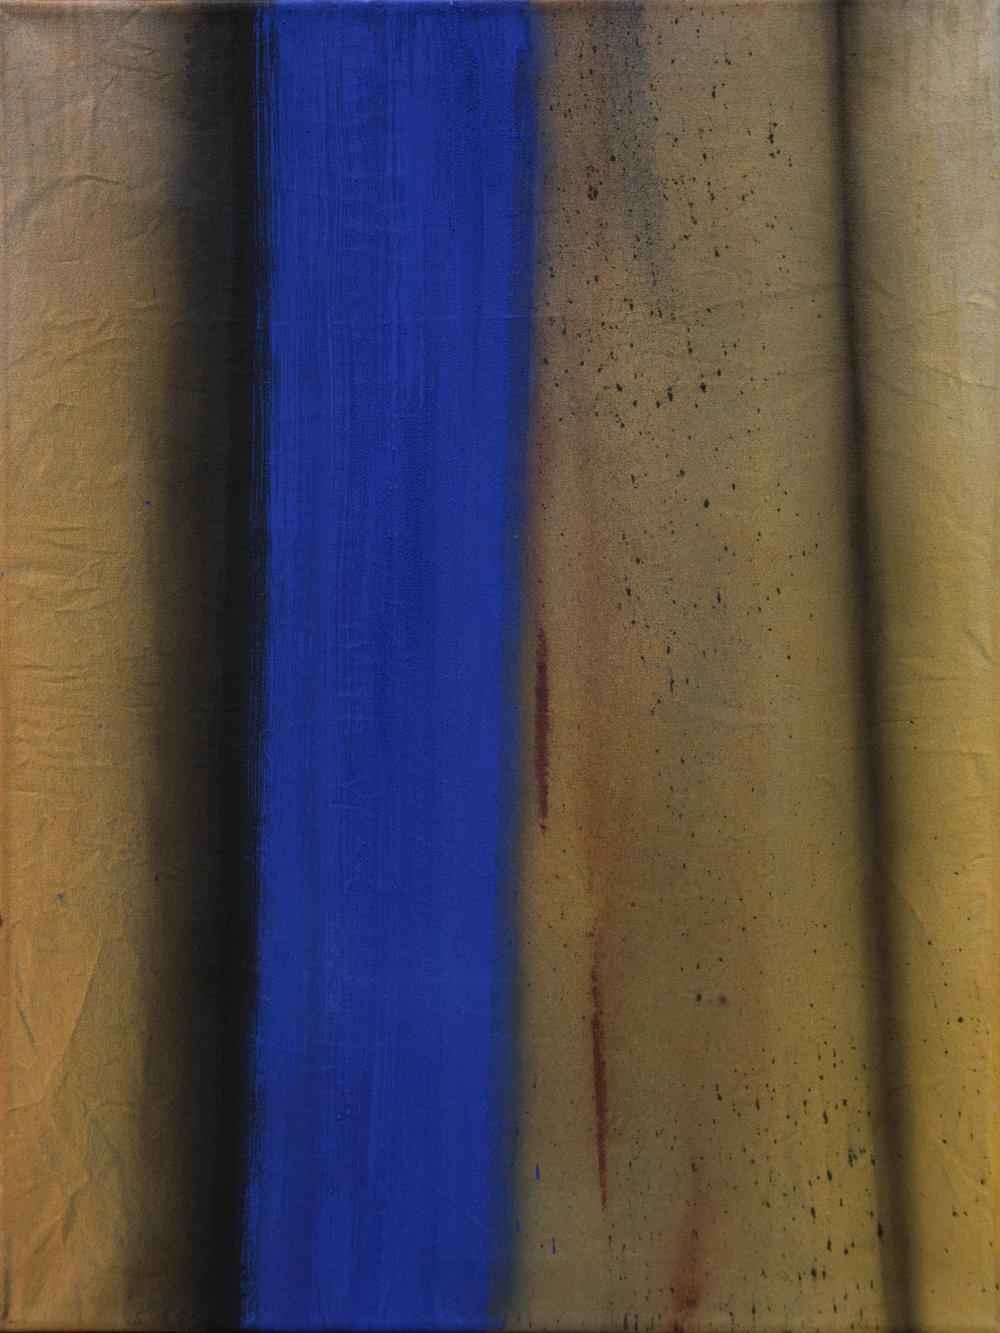 DONATION 1 Herbert Egger –TRANSIT I-2012-60 x 80 cm-pigment and acrylic on canvas.jpg